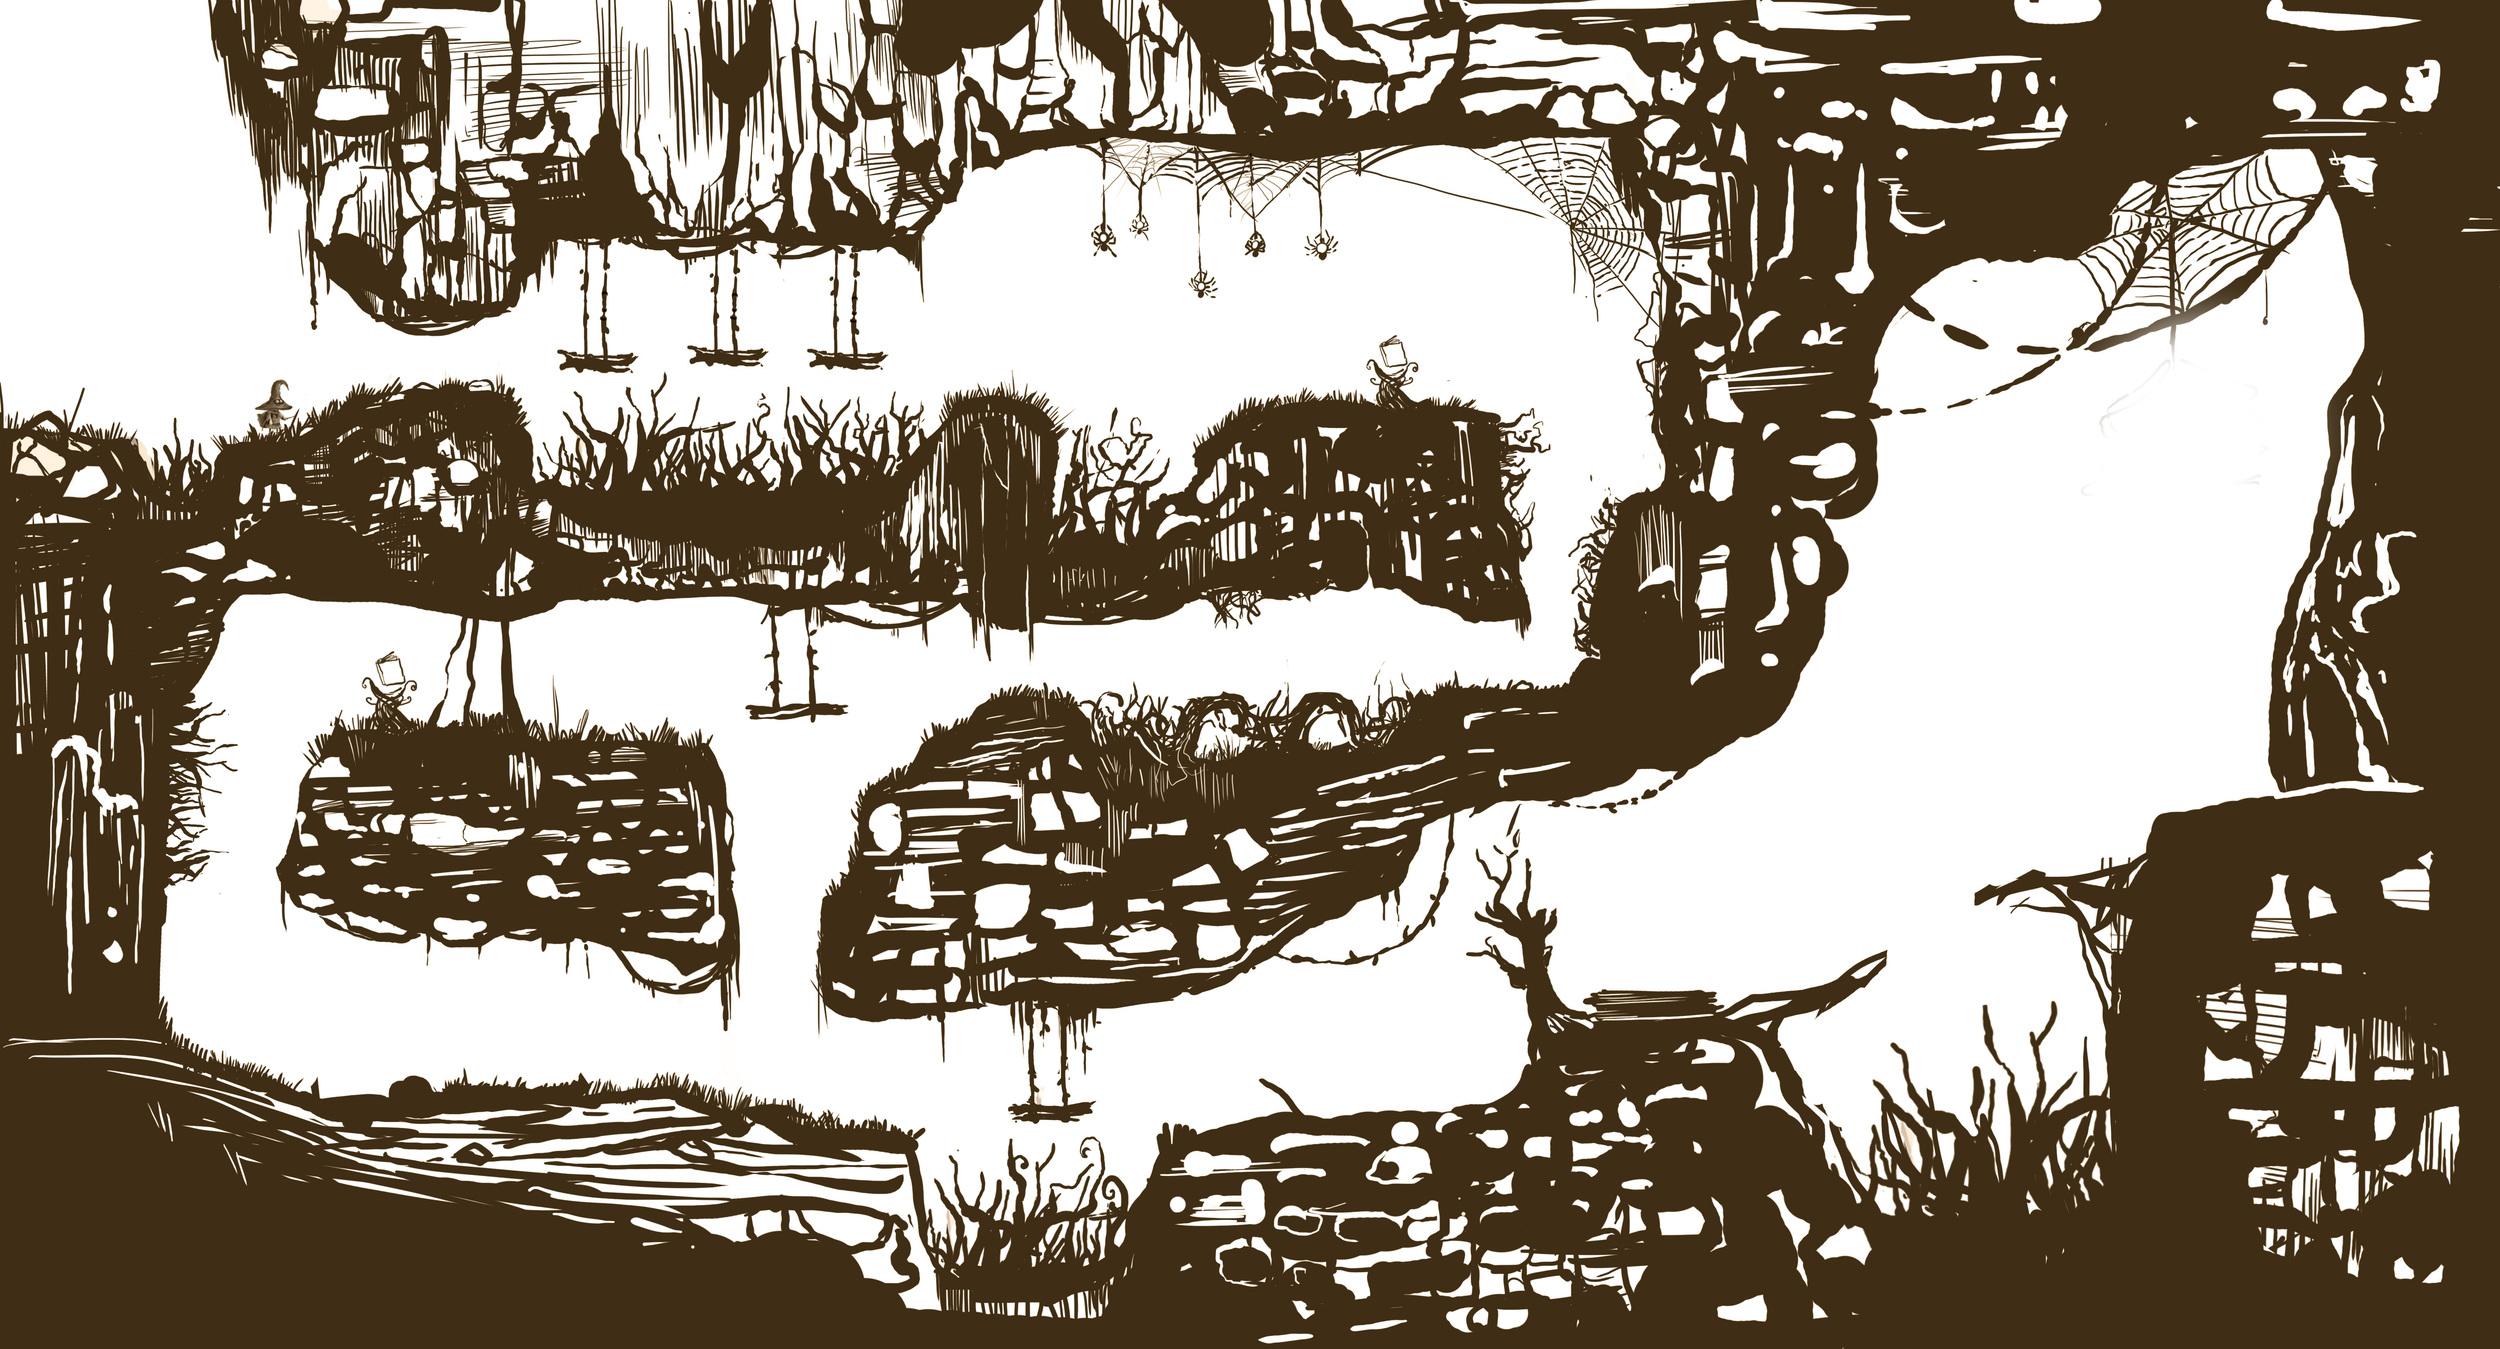 Tutorial Level Sketch